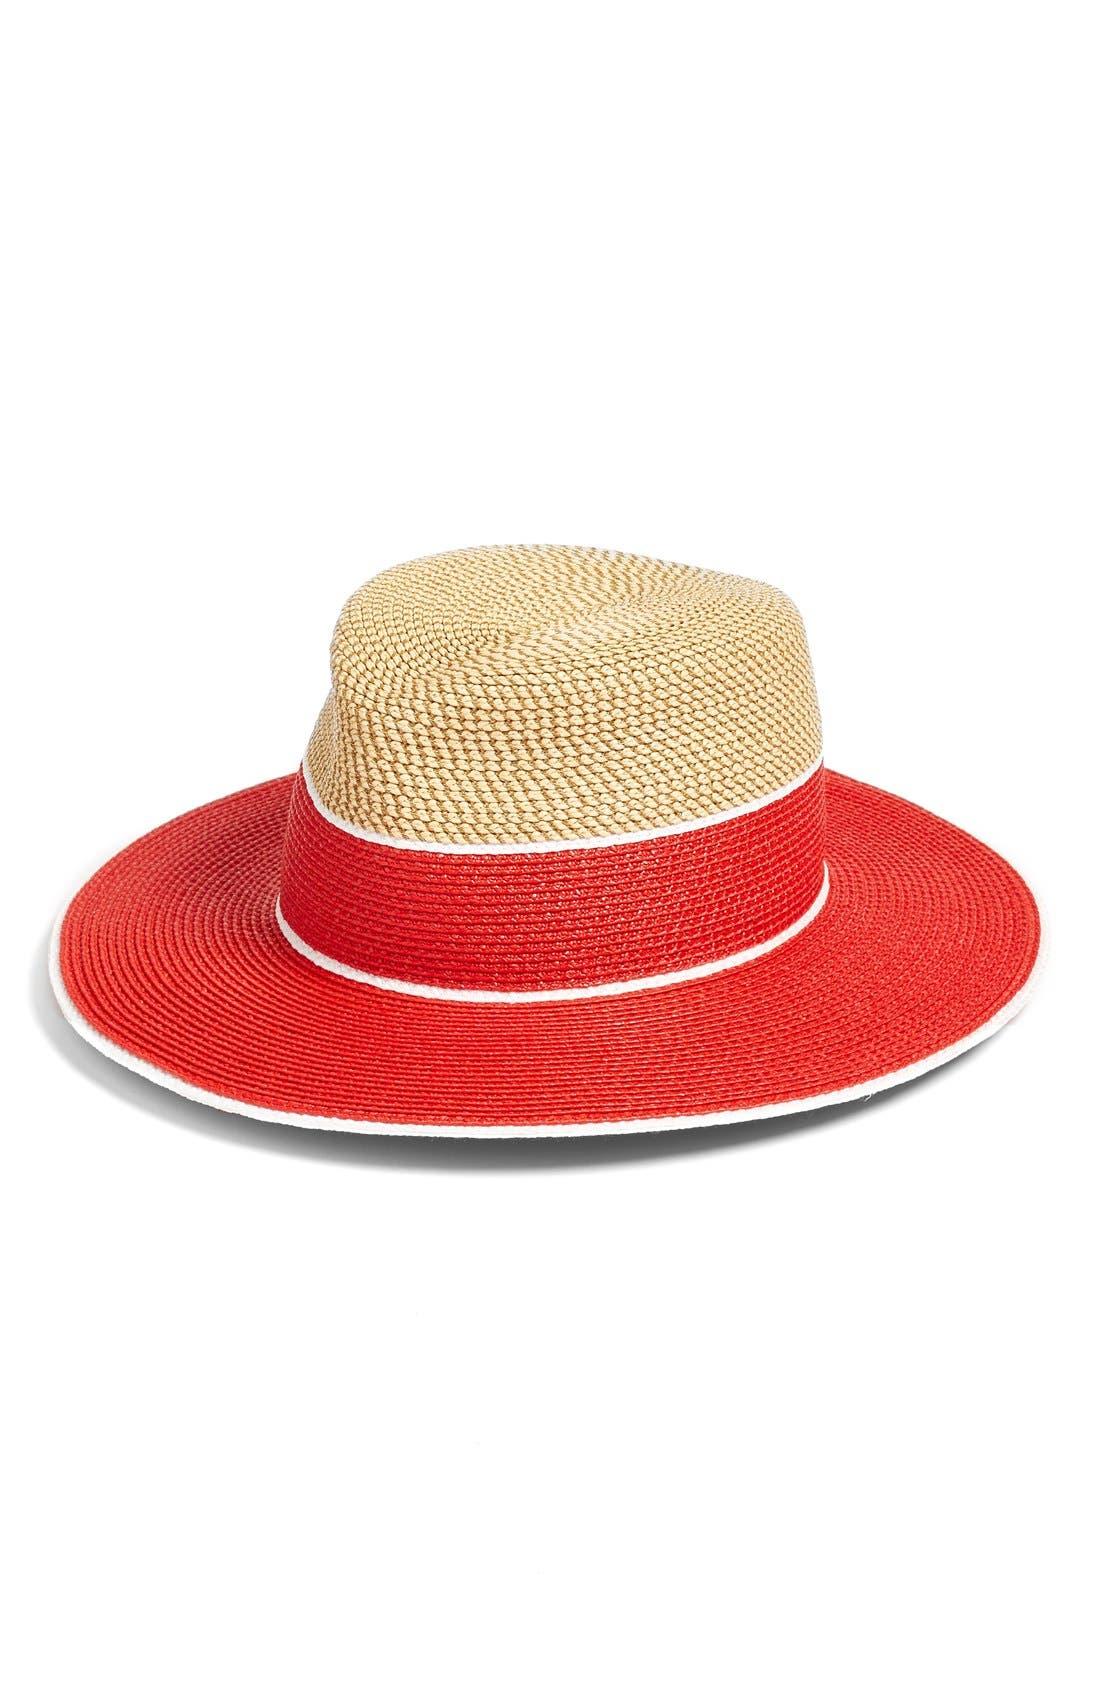 Eric Javits 'Georgia' Woven Hat